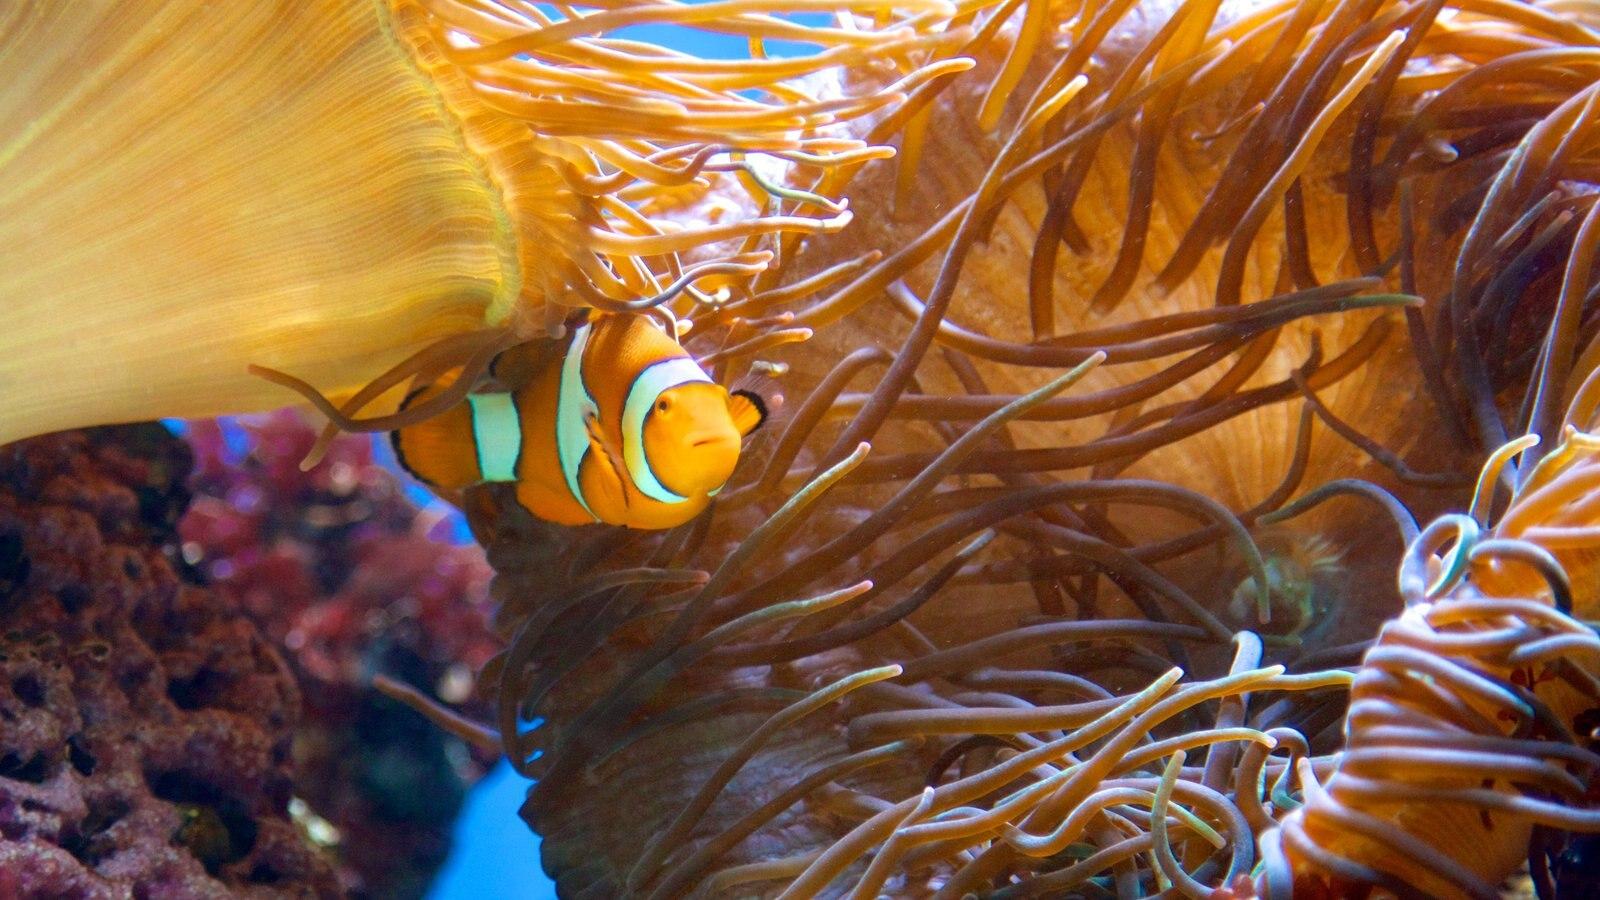 Fish aquarium in niagara falls - Aquarium Of Niagara Showing Marine Life